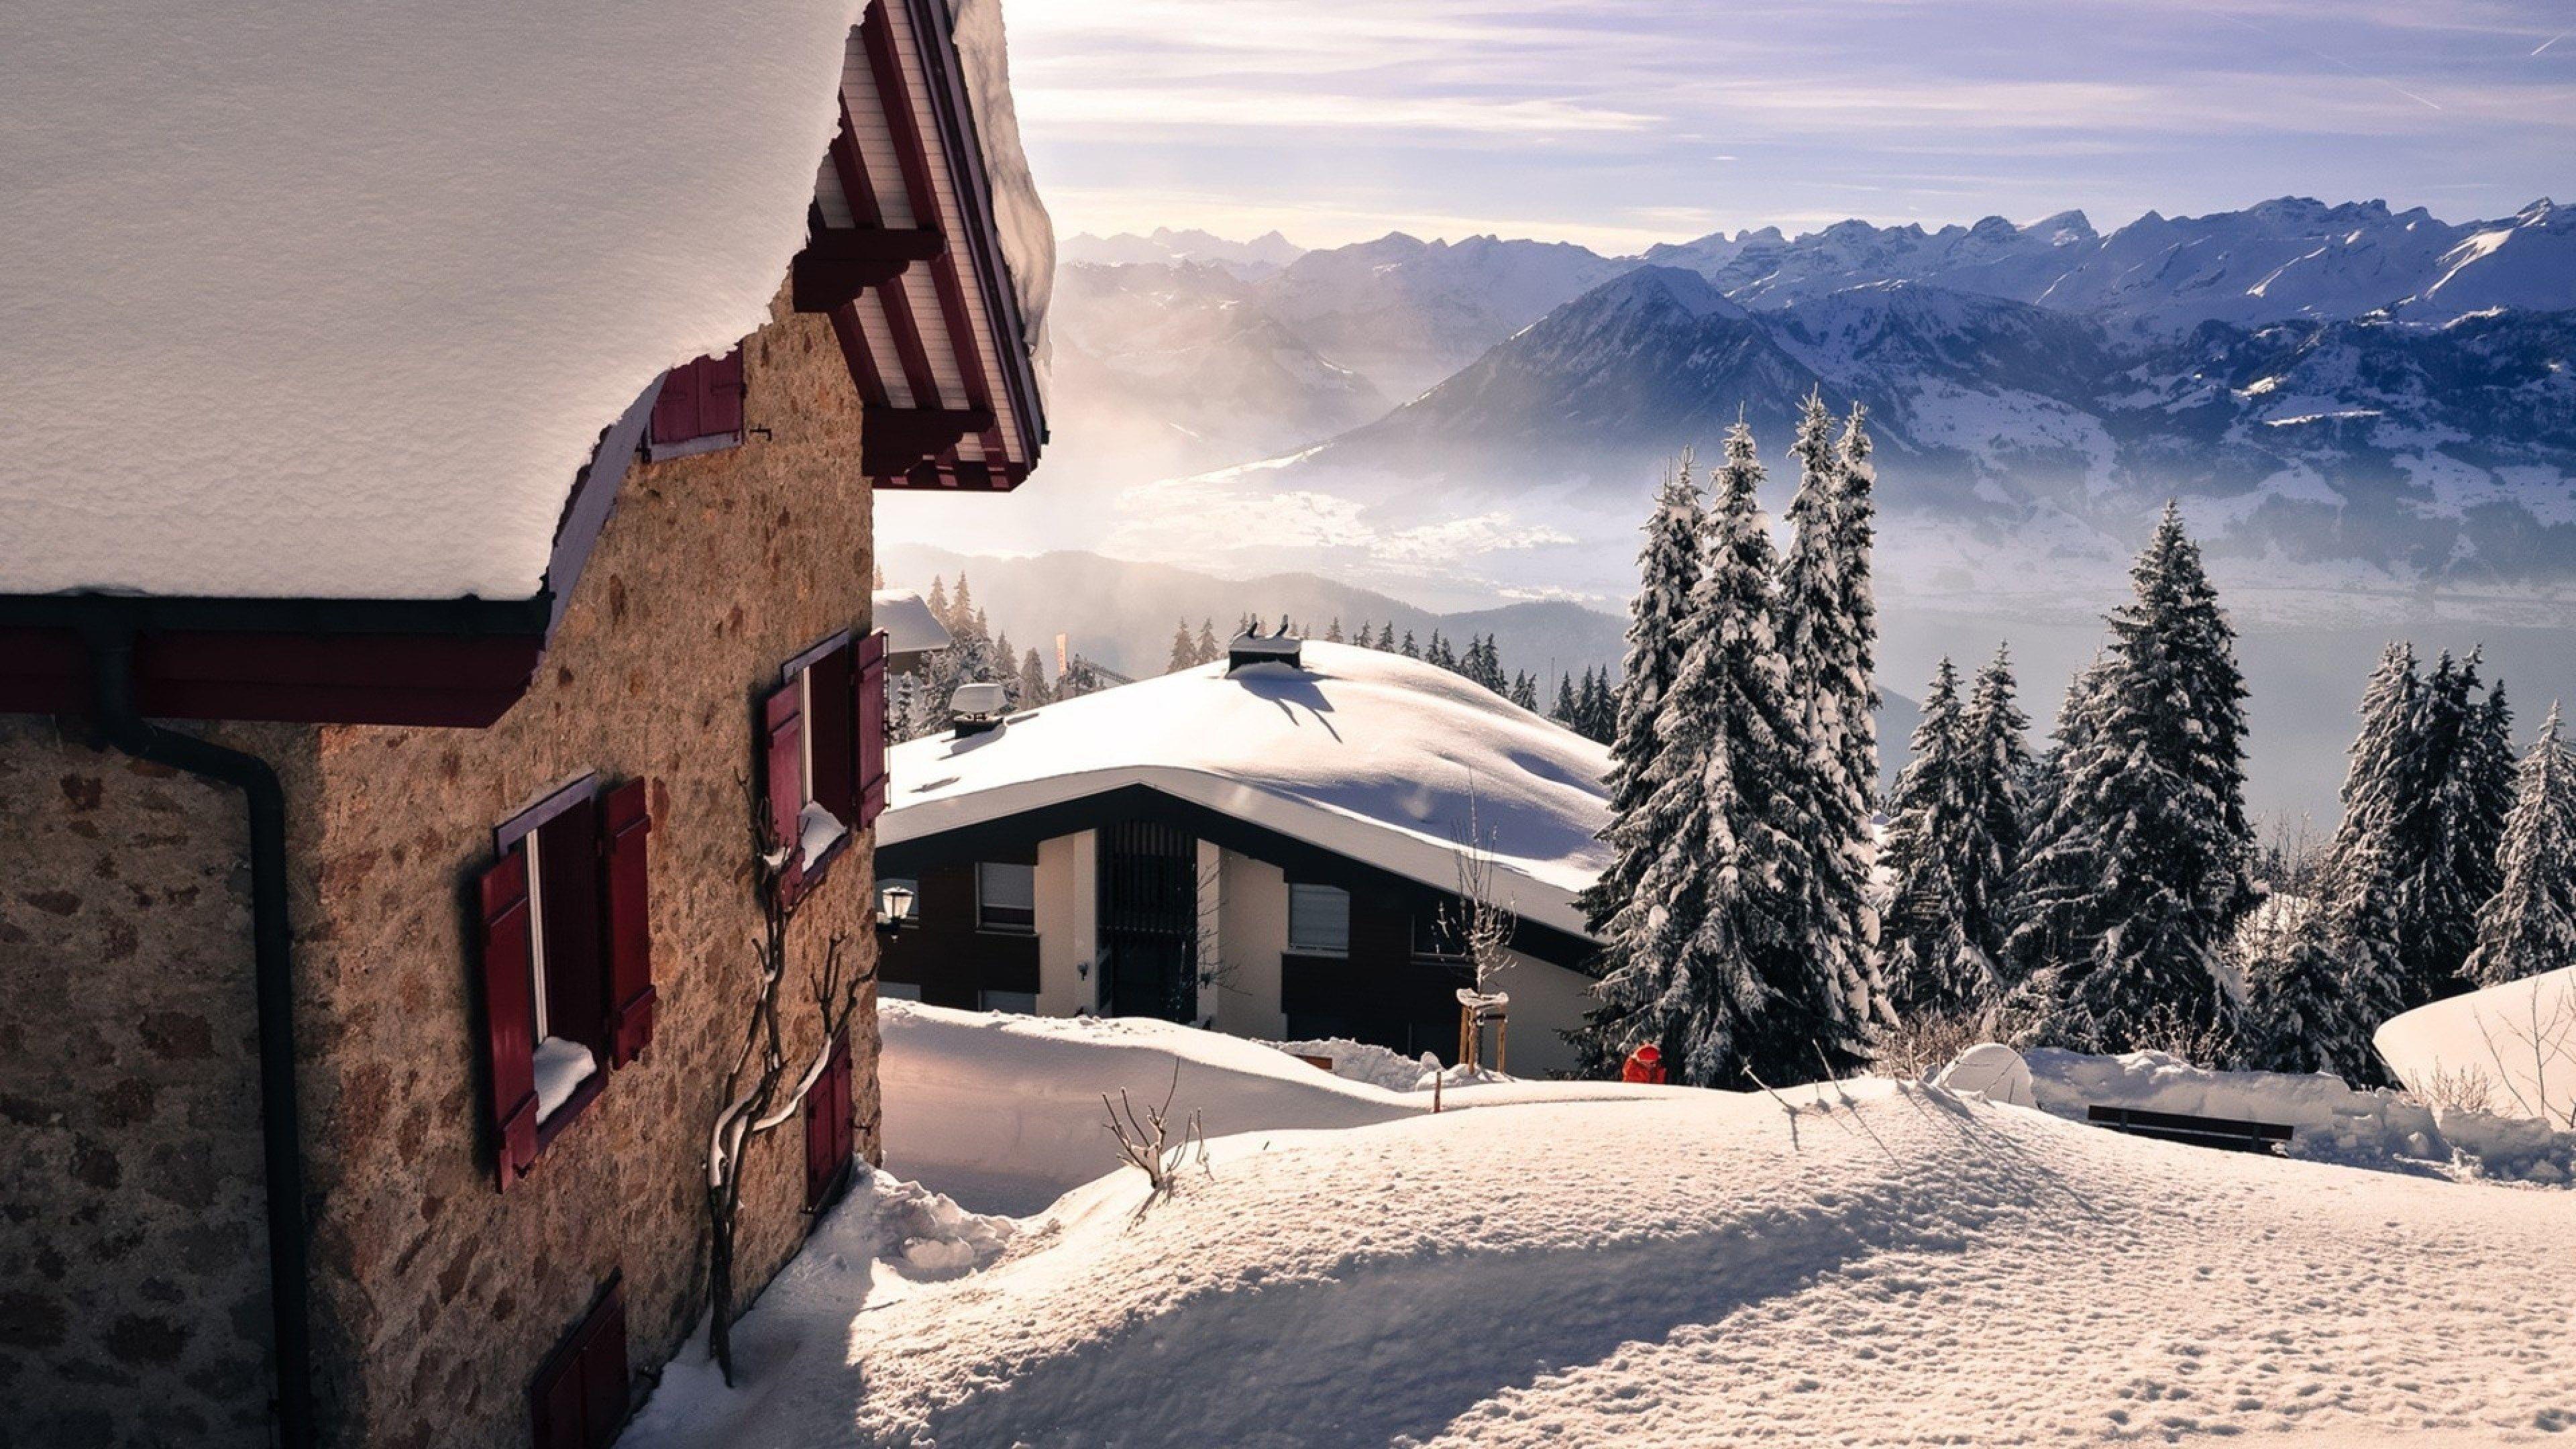 Snow Mountains Winter Wallpaper Hd